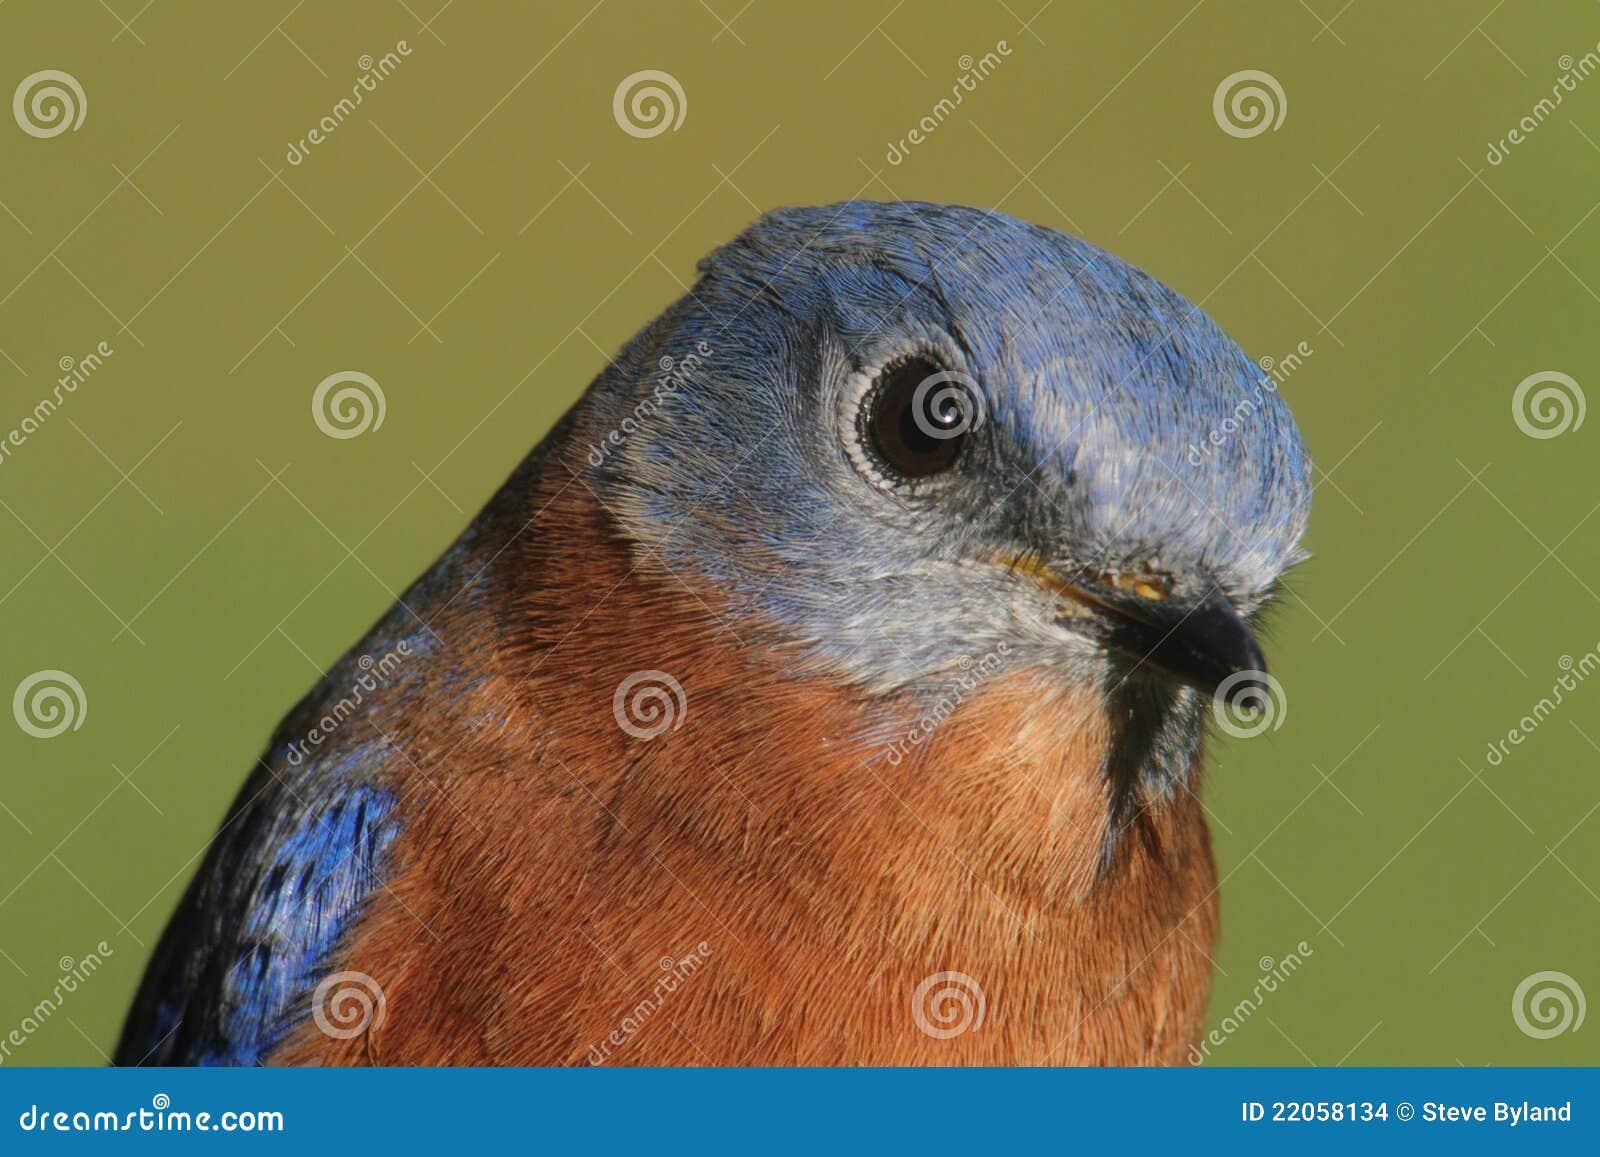 eastern bluebird closeup stock images